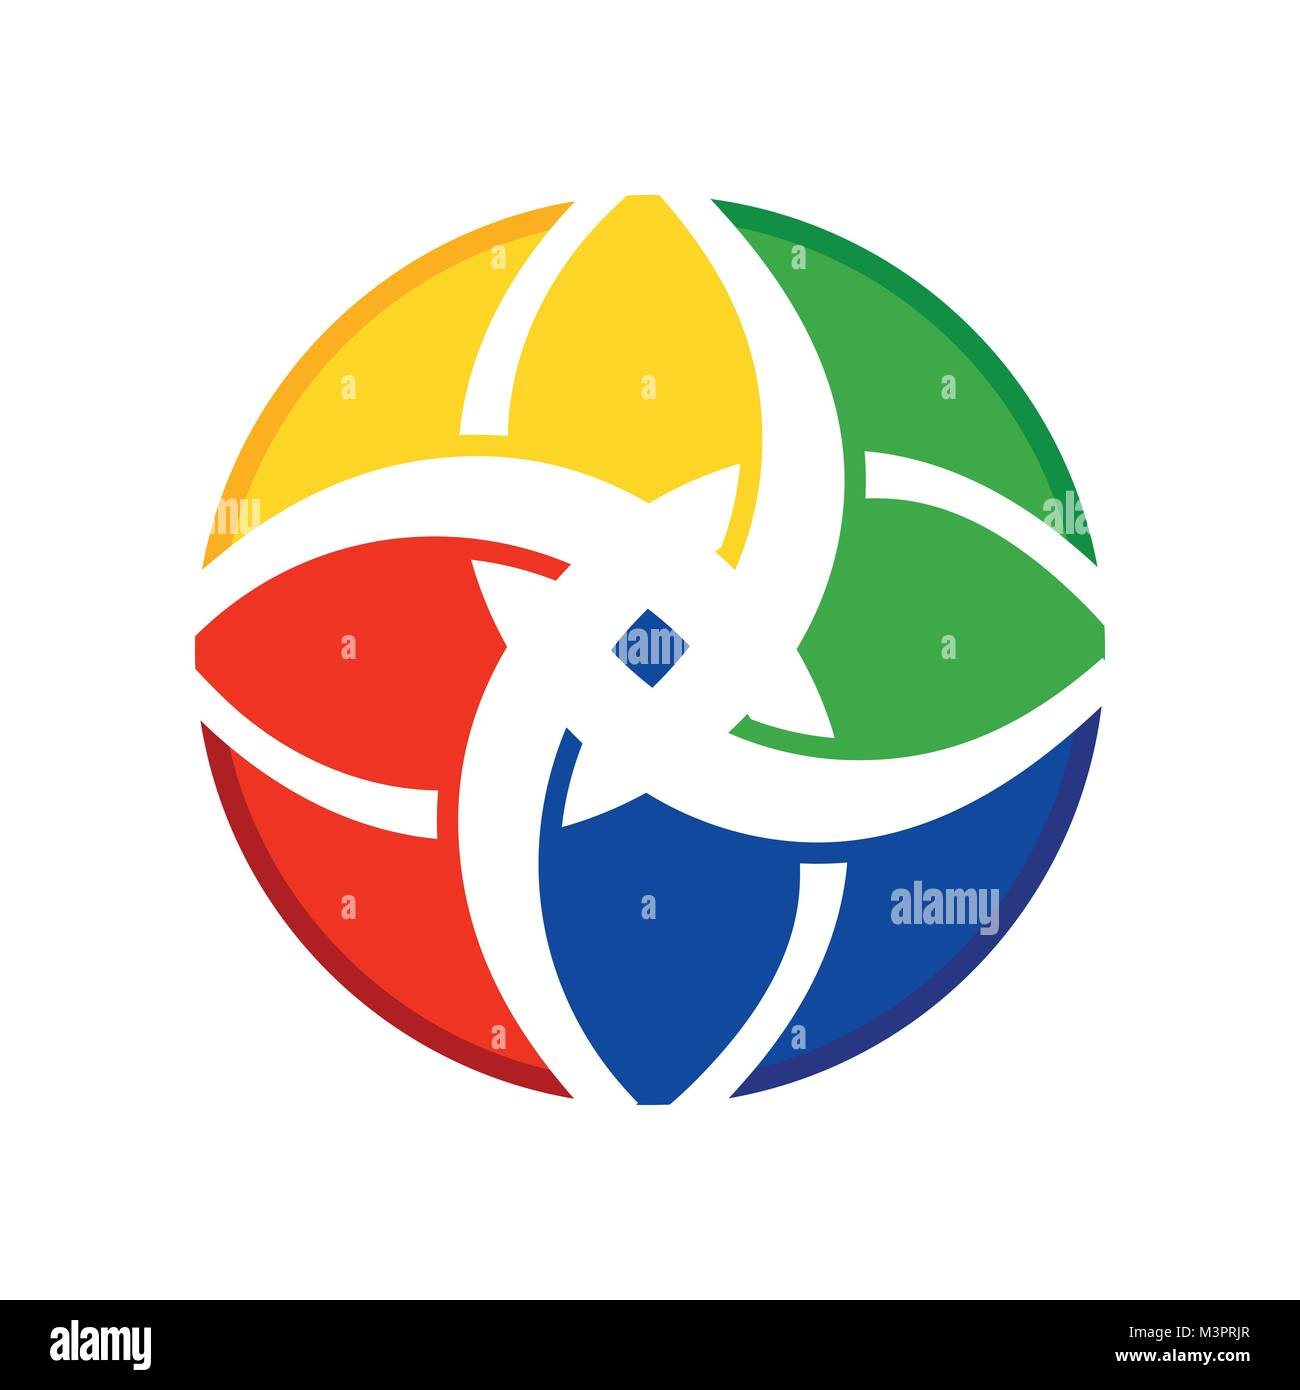 Flower Harmony Of Diversity Symbol Vector Graphic Logo